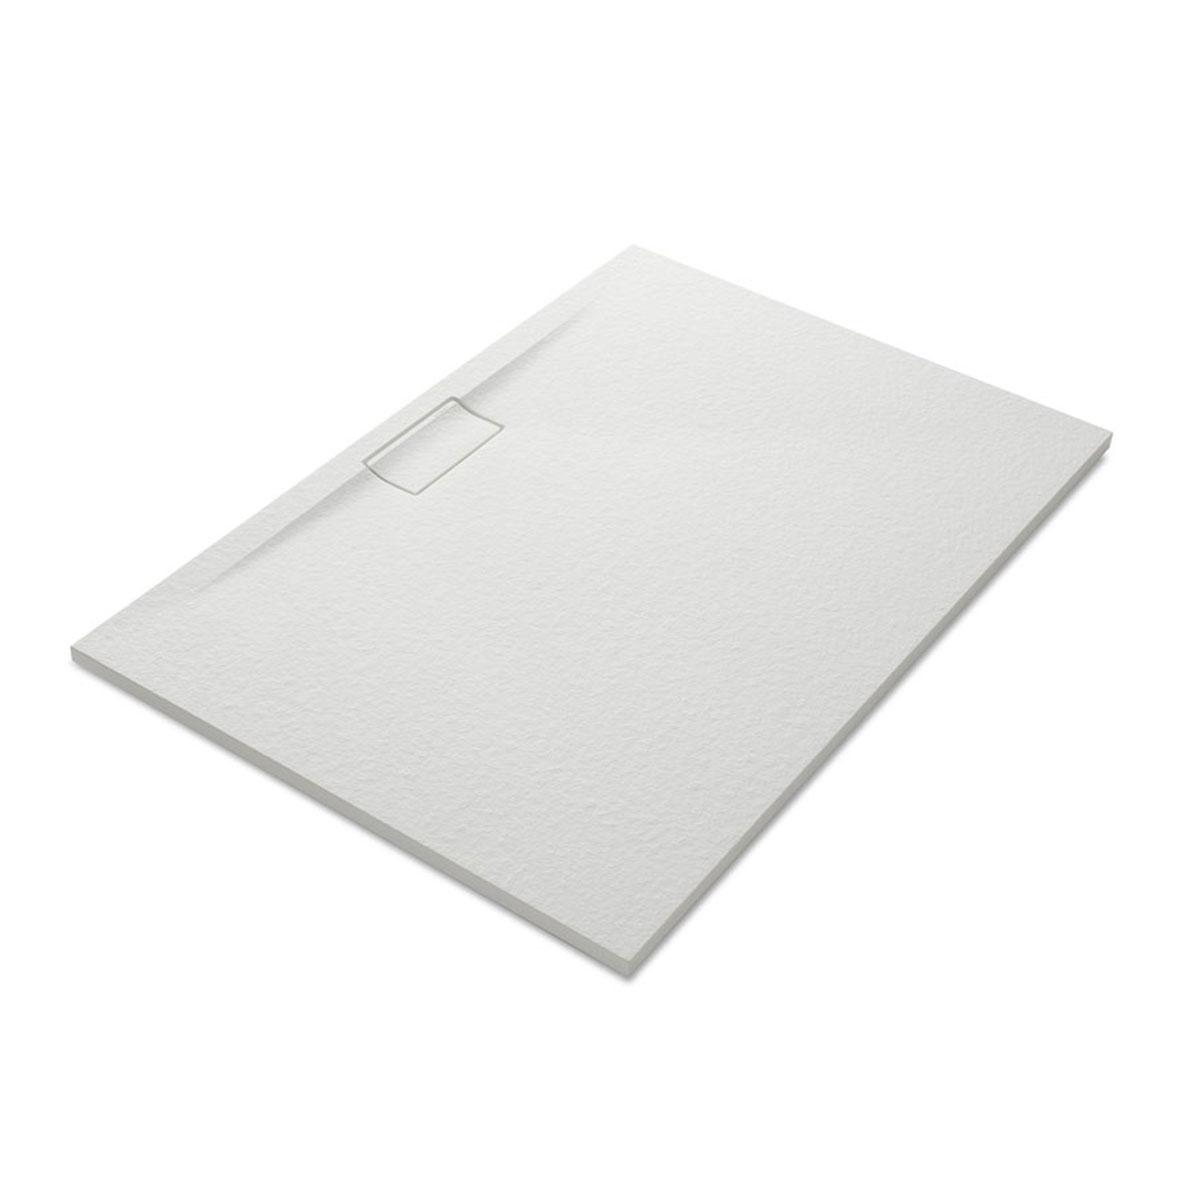 Plato de ducha rectangular 120x80 Nova Stone Cover Blanco